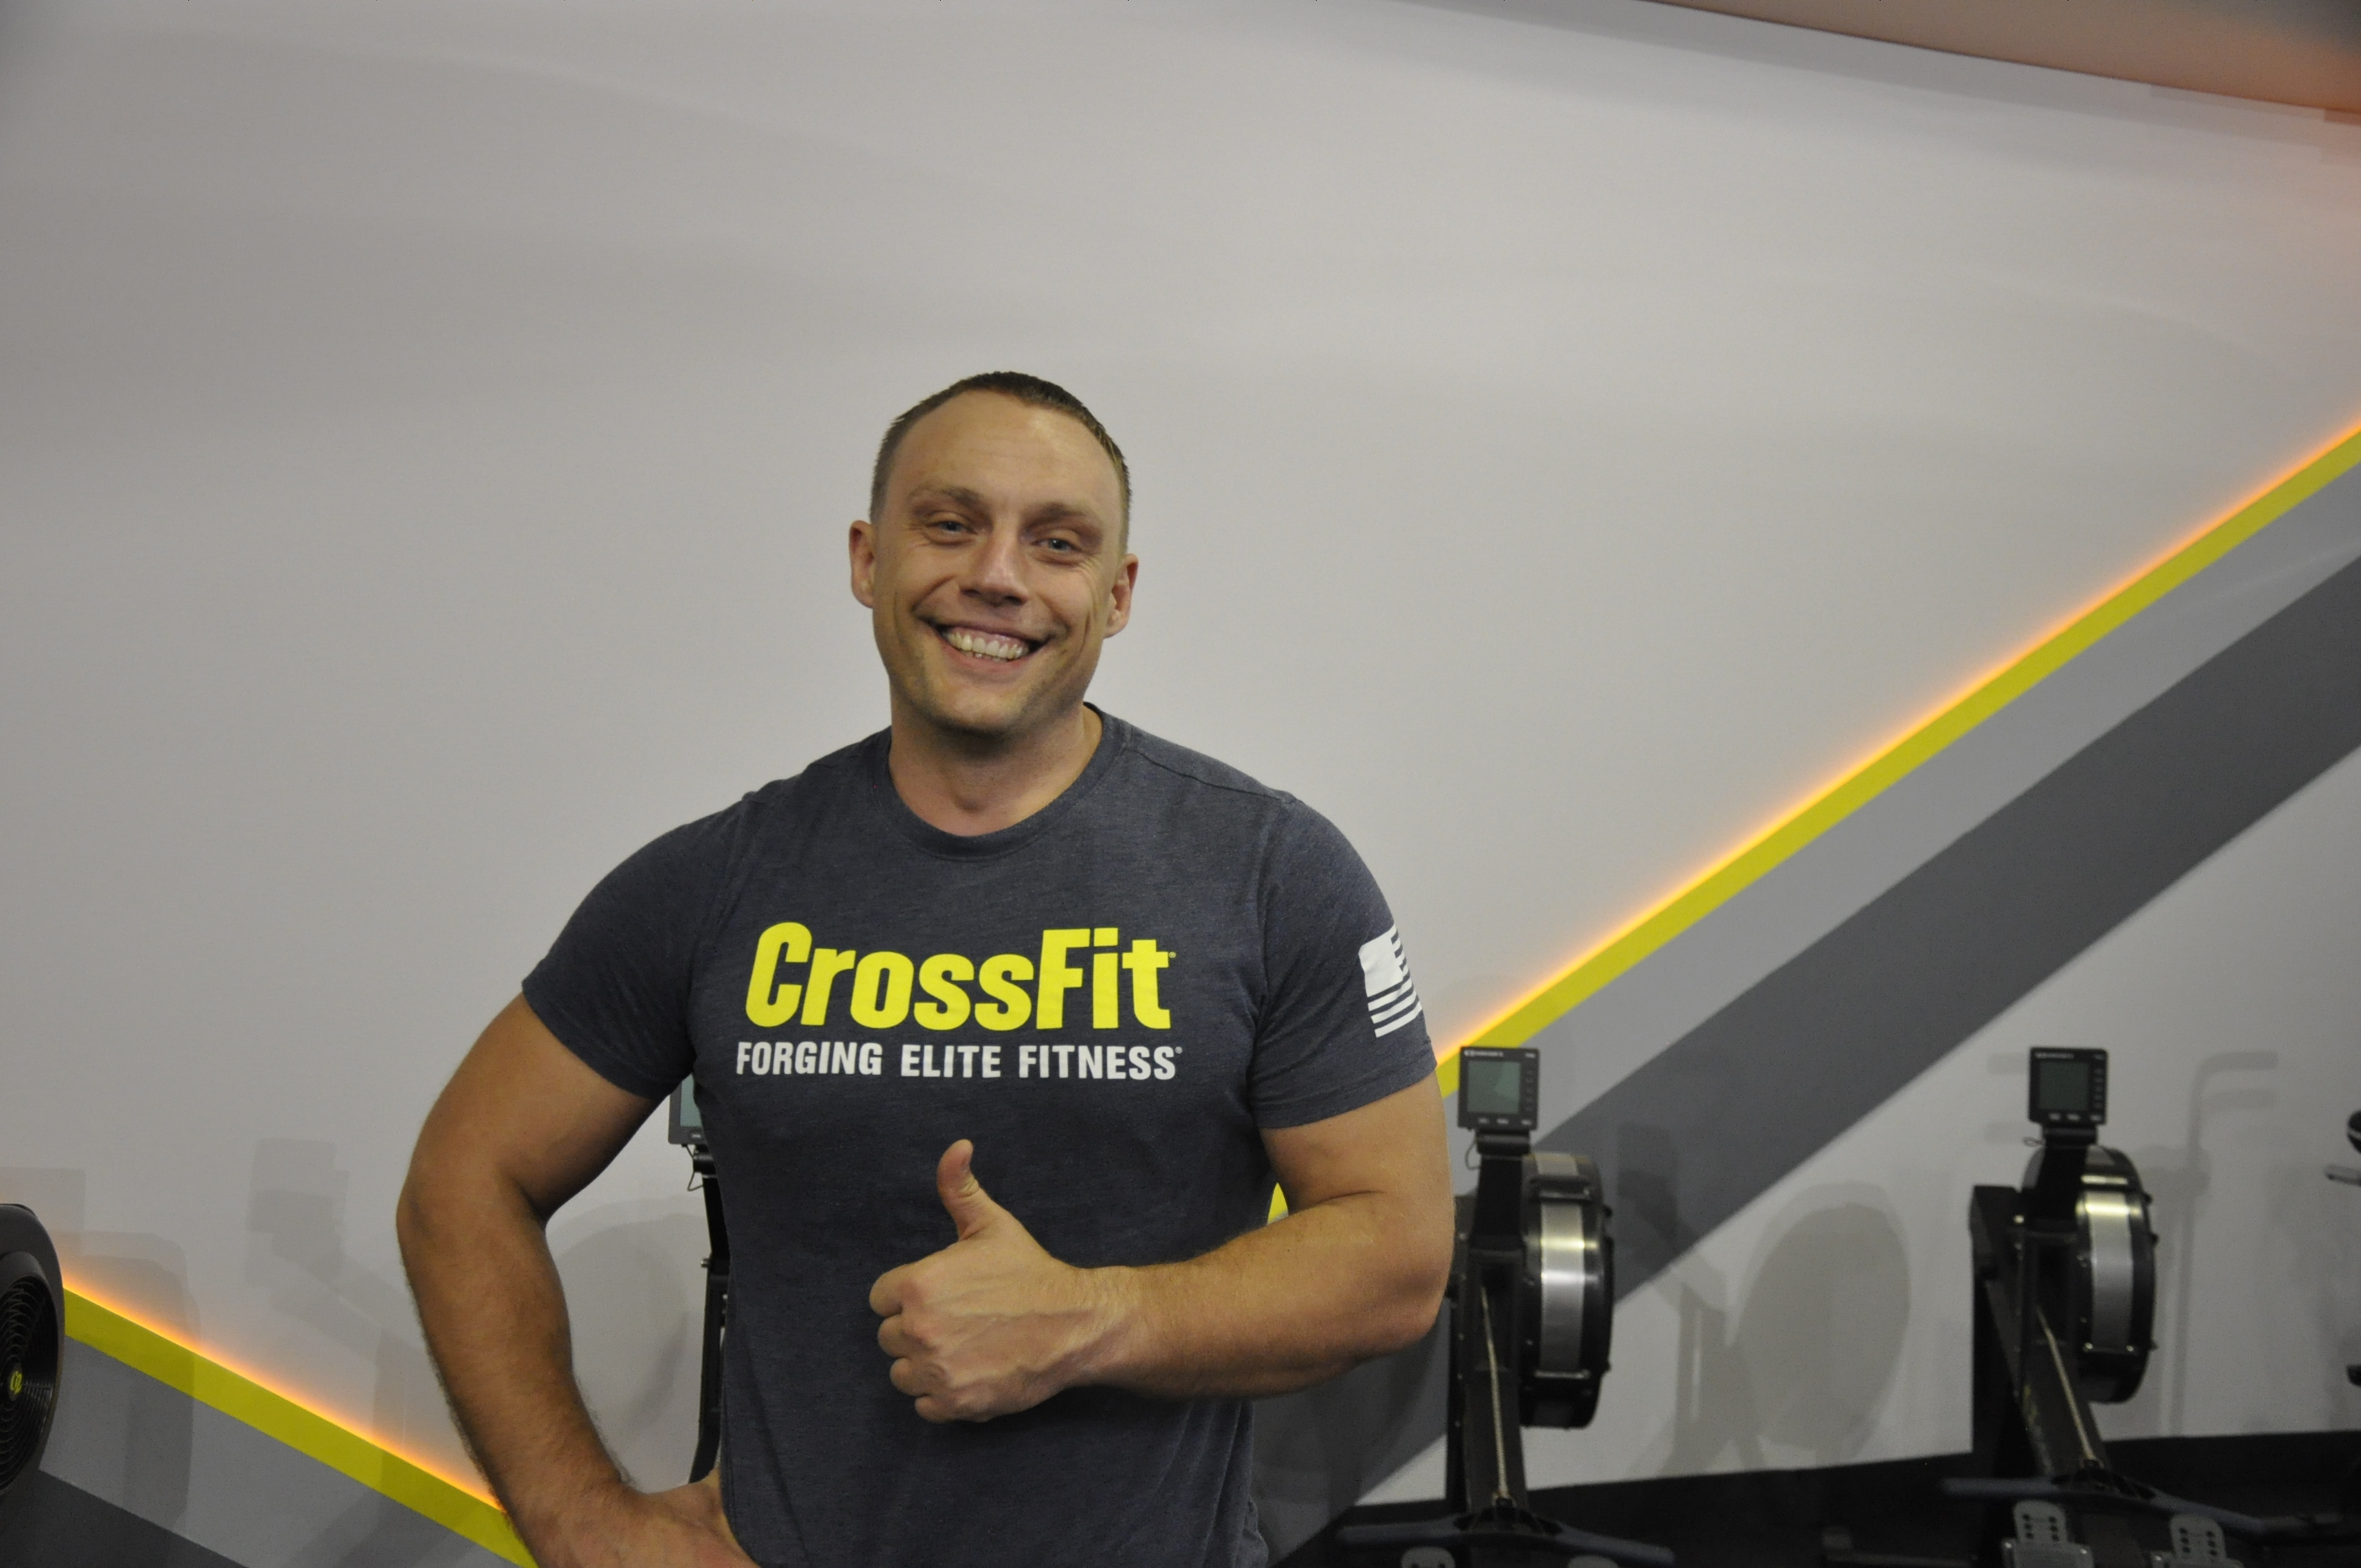 Ланецкий Андрей – Crossfit тренер